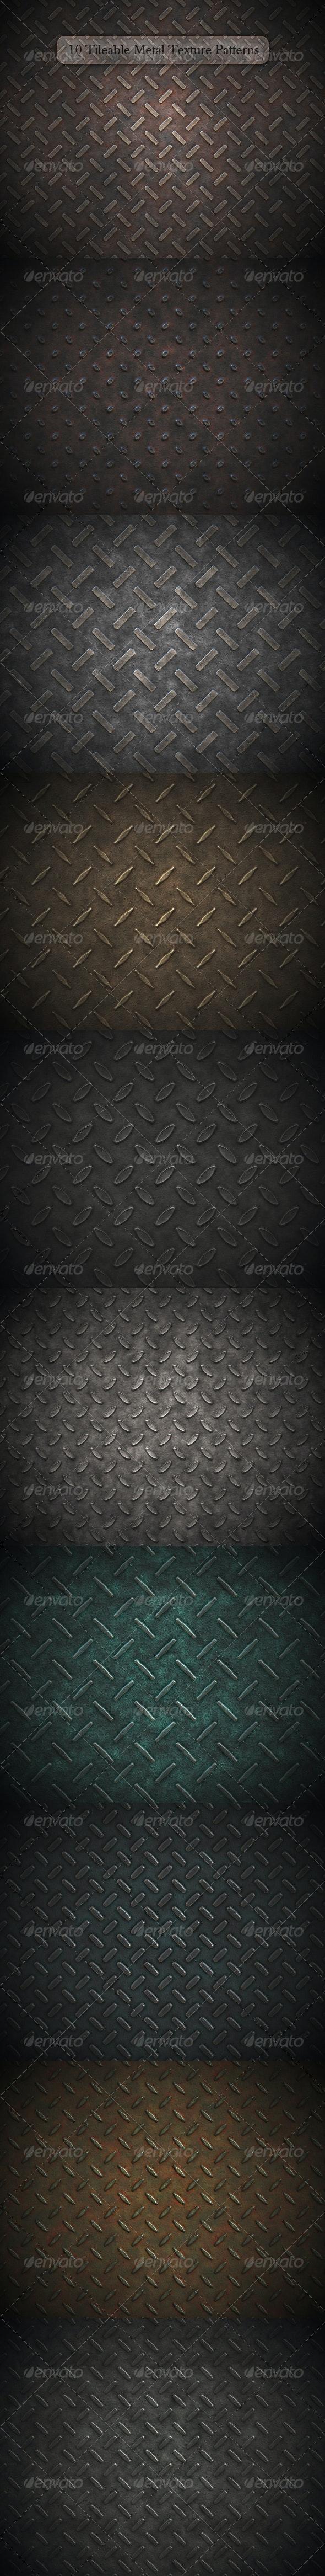 10 Tileable Metal Texture Patterns - Metal Textures